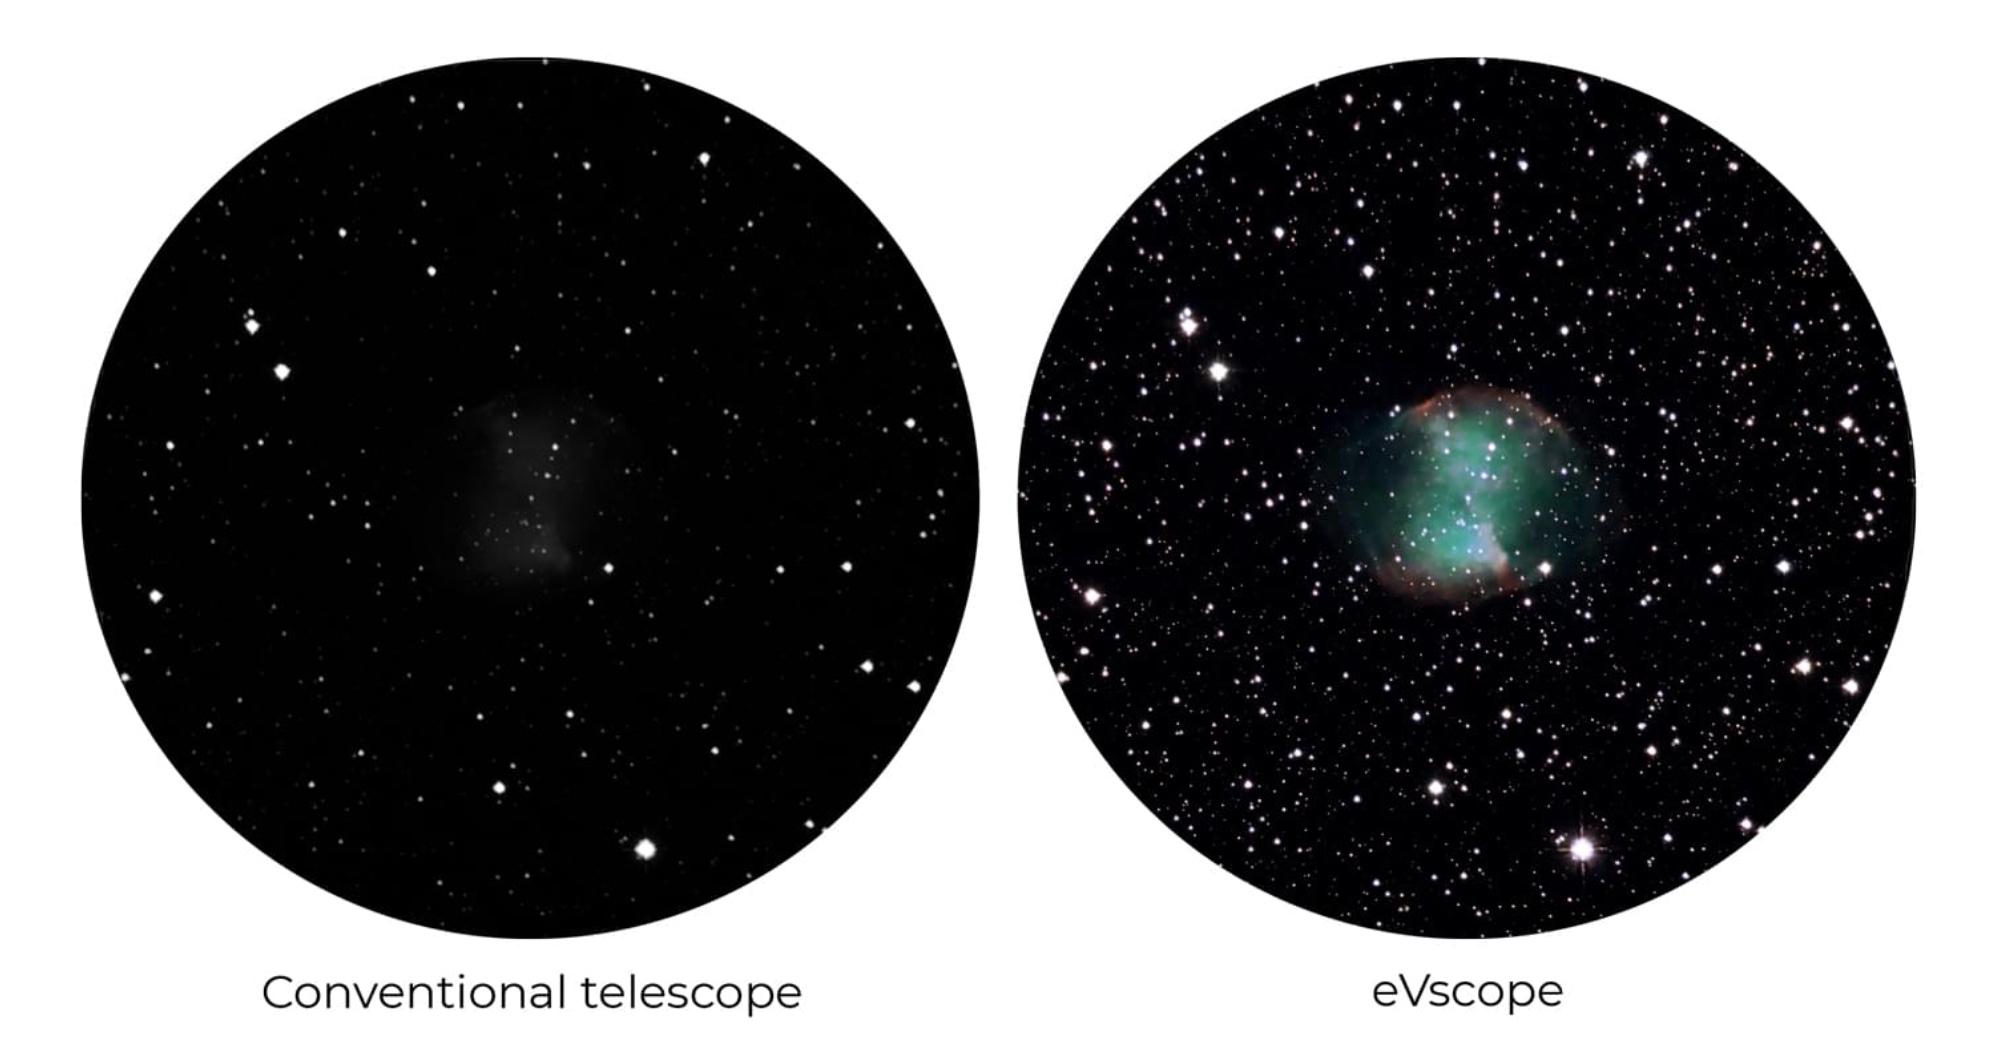 Evscope vs telescopio tradicional